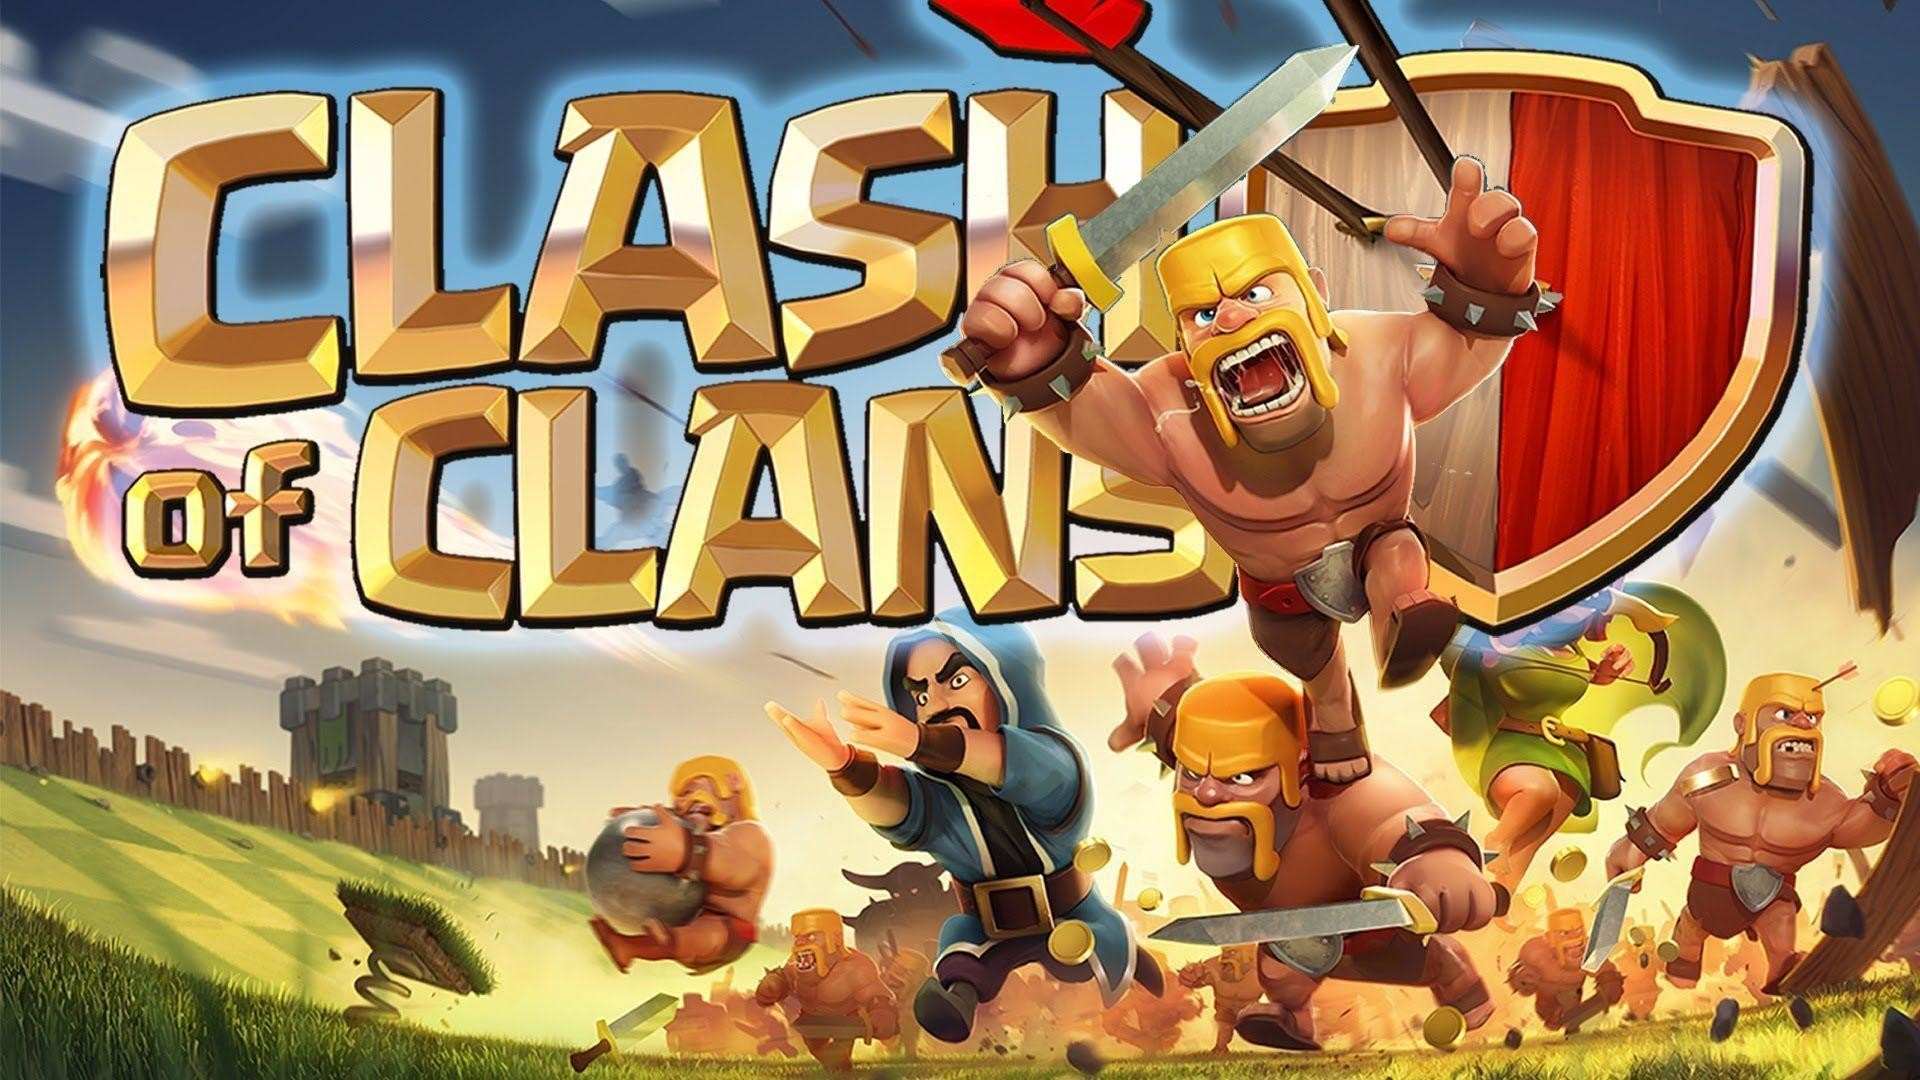 Clash Of Clans Wallpapers | WeNeedFun